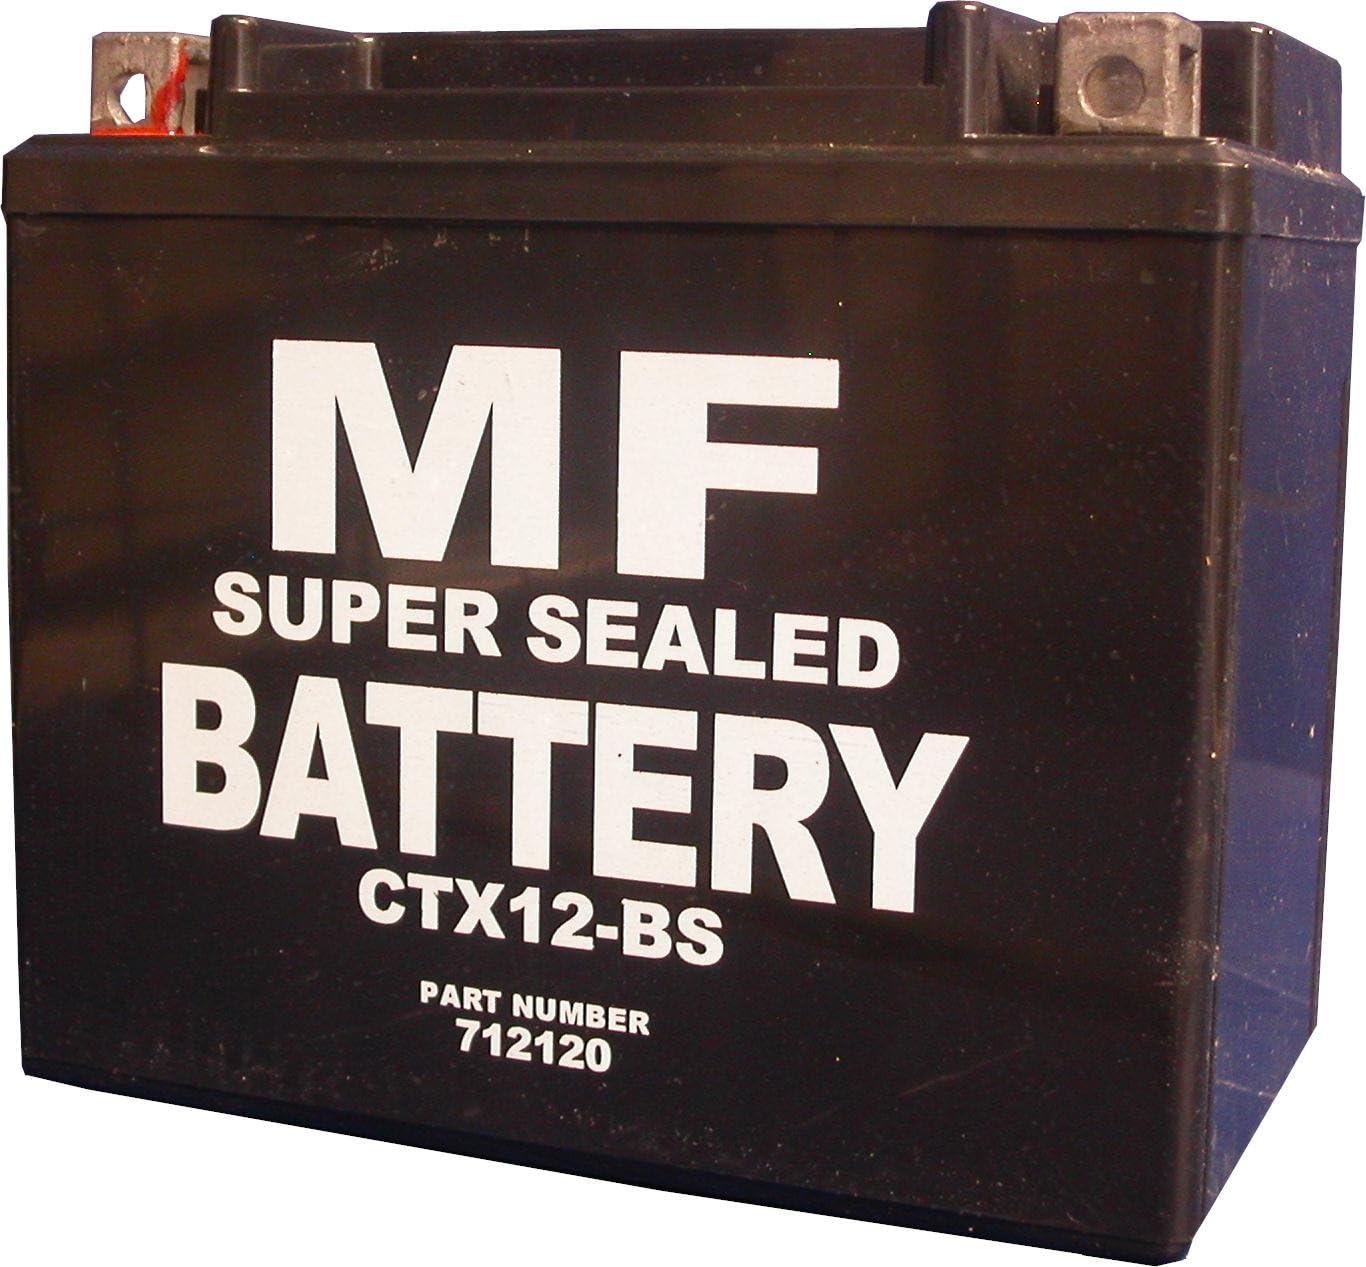 Kawasaki ZR-7S ZR750H3 CTX12-BS YTX12-BS Motorcycle battery 2003